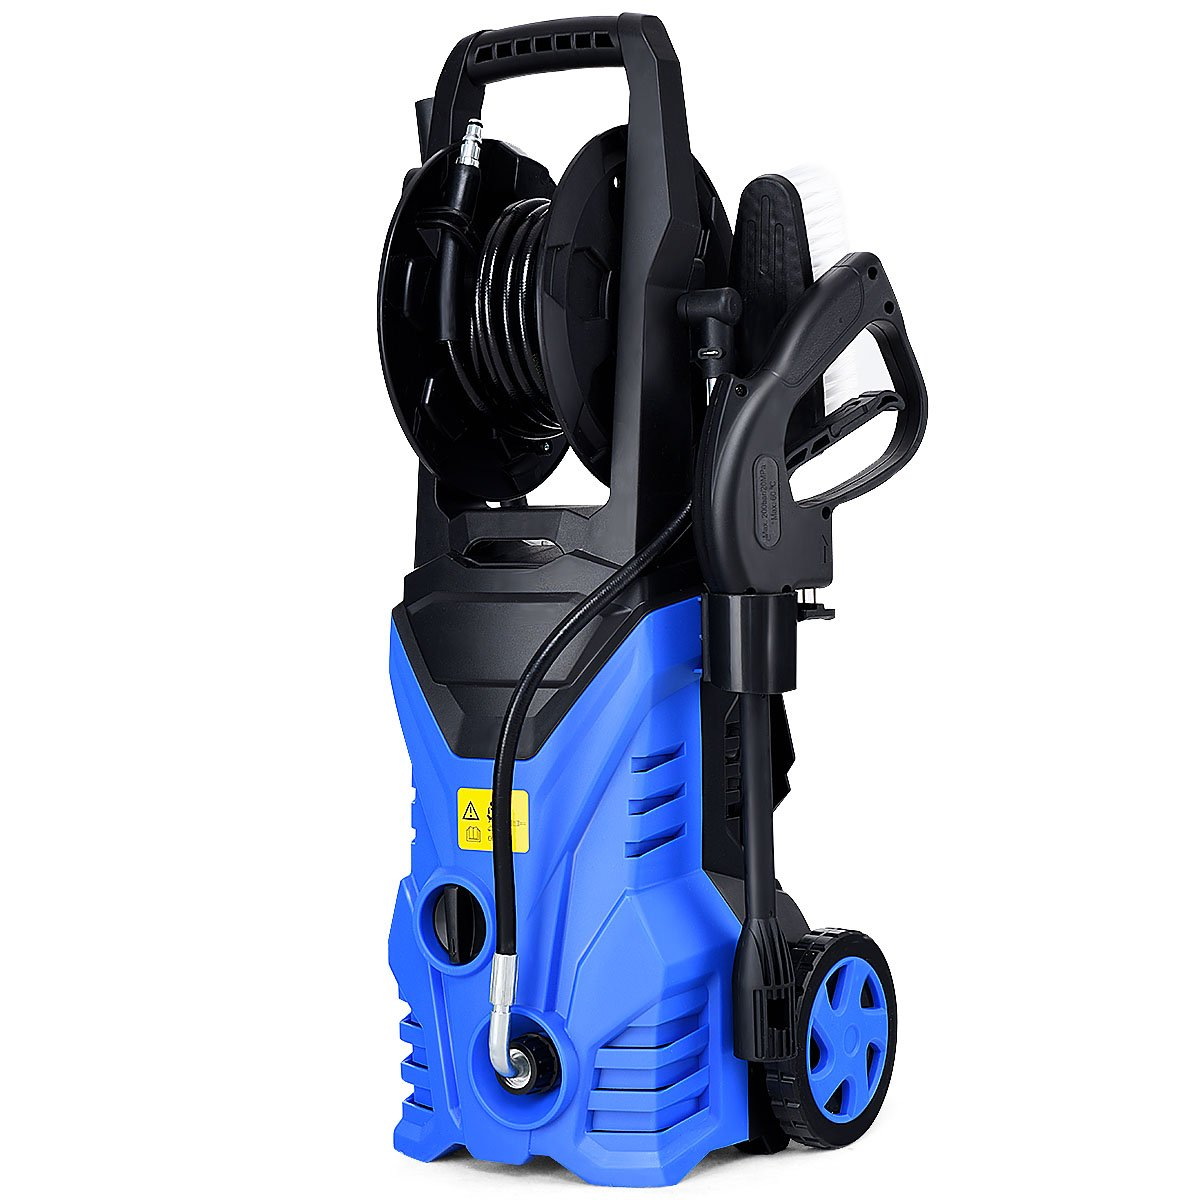 Goplus Electric High Pressure Washer 2030PSI 1.6GPM Power Pressure Washer Machine w/Wash Brush and High Pressure Hose (Blue)